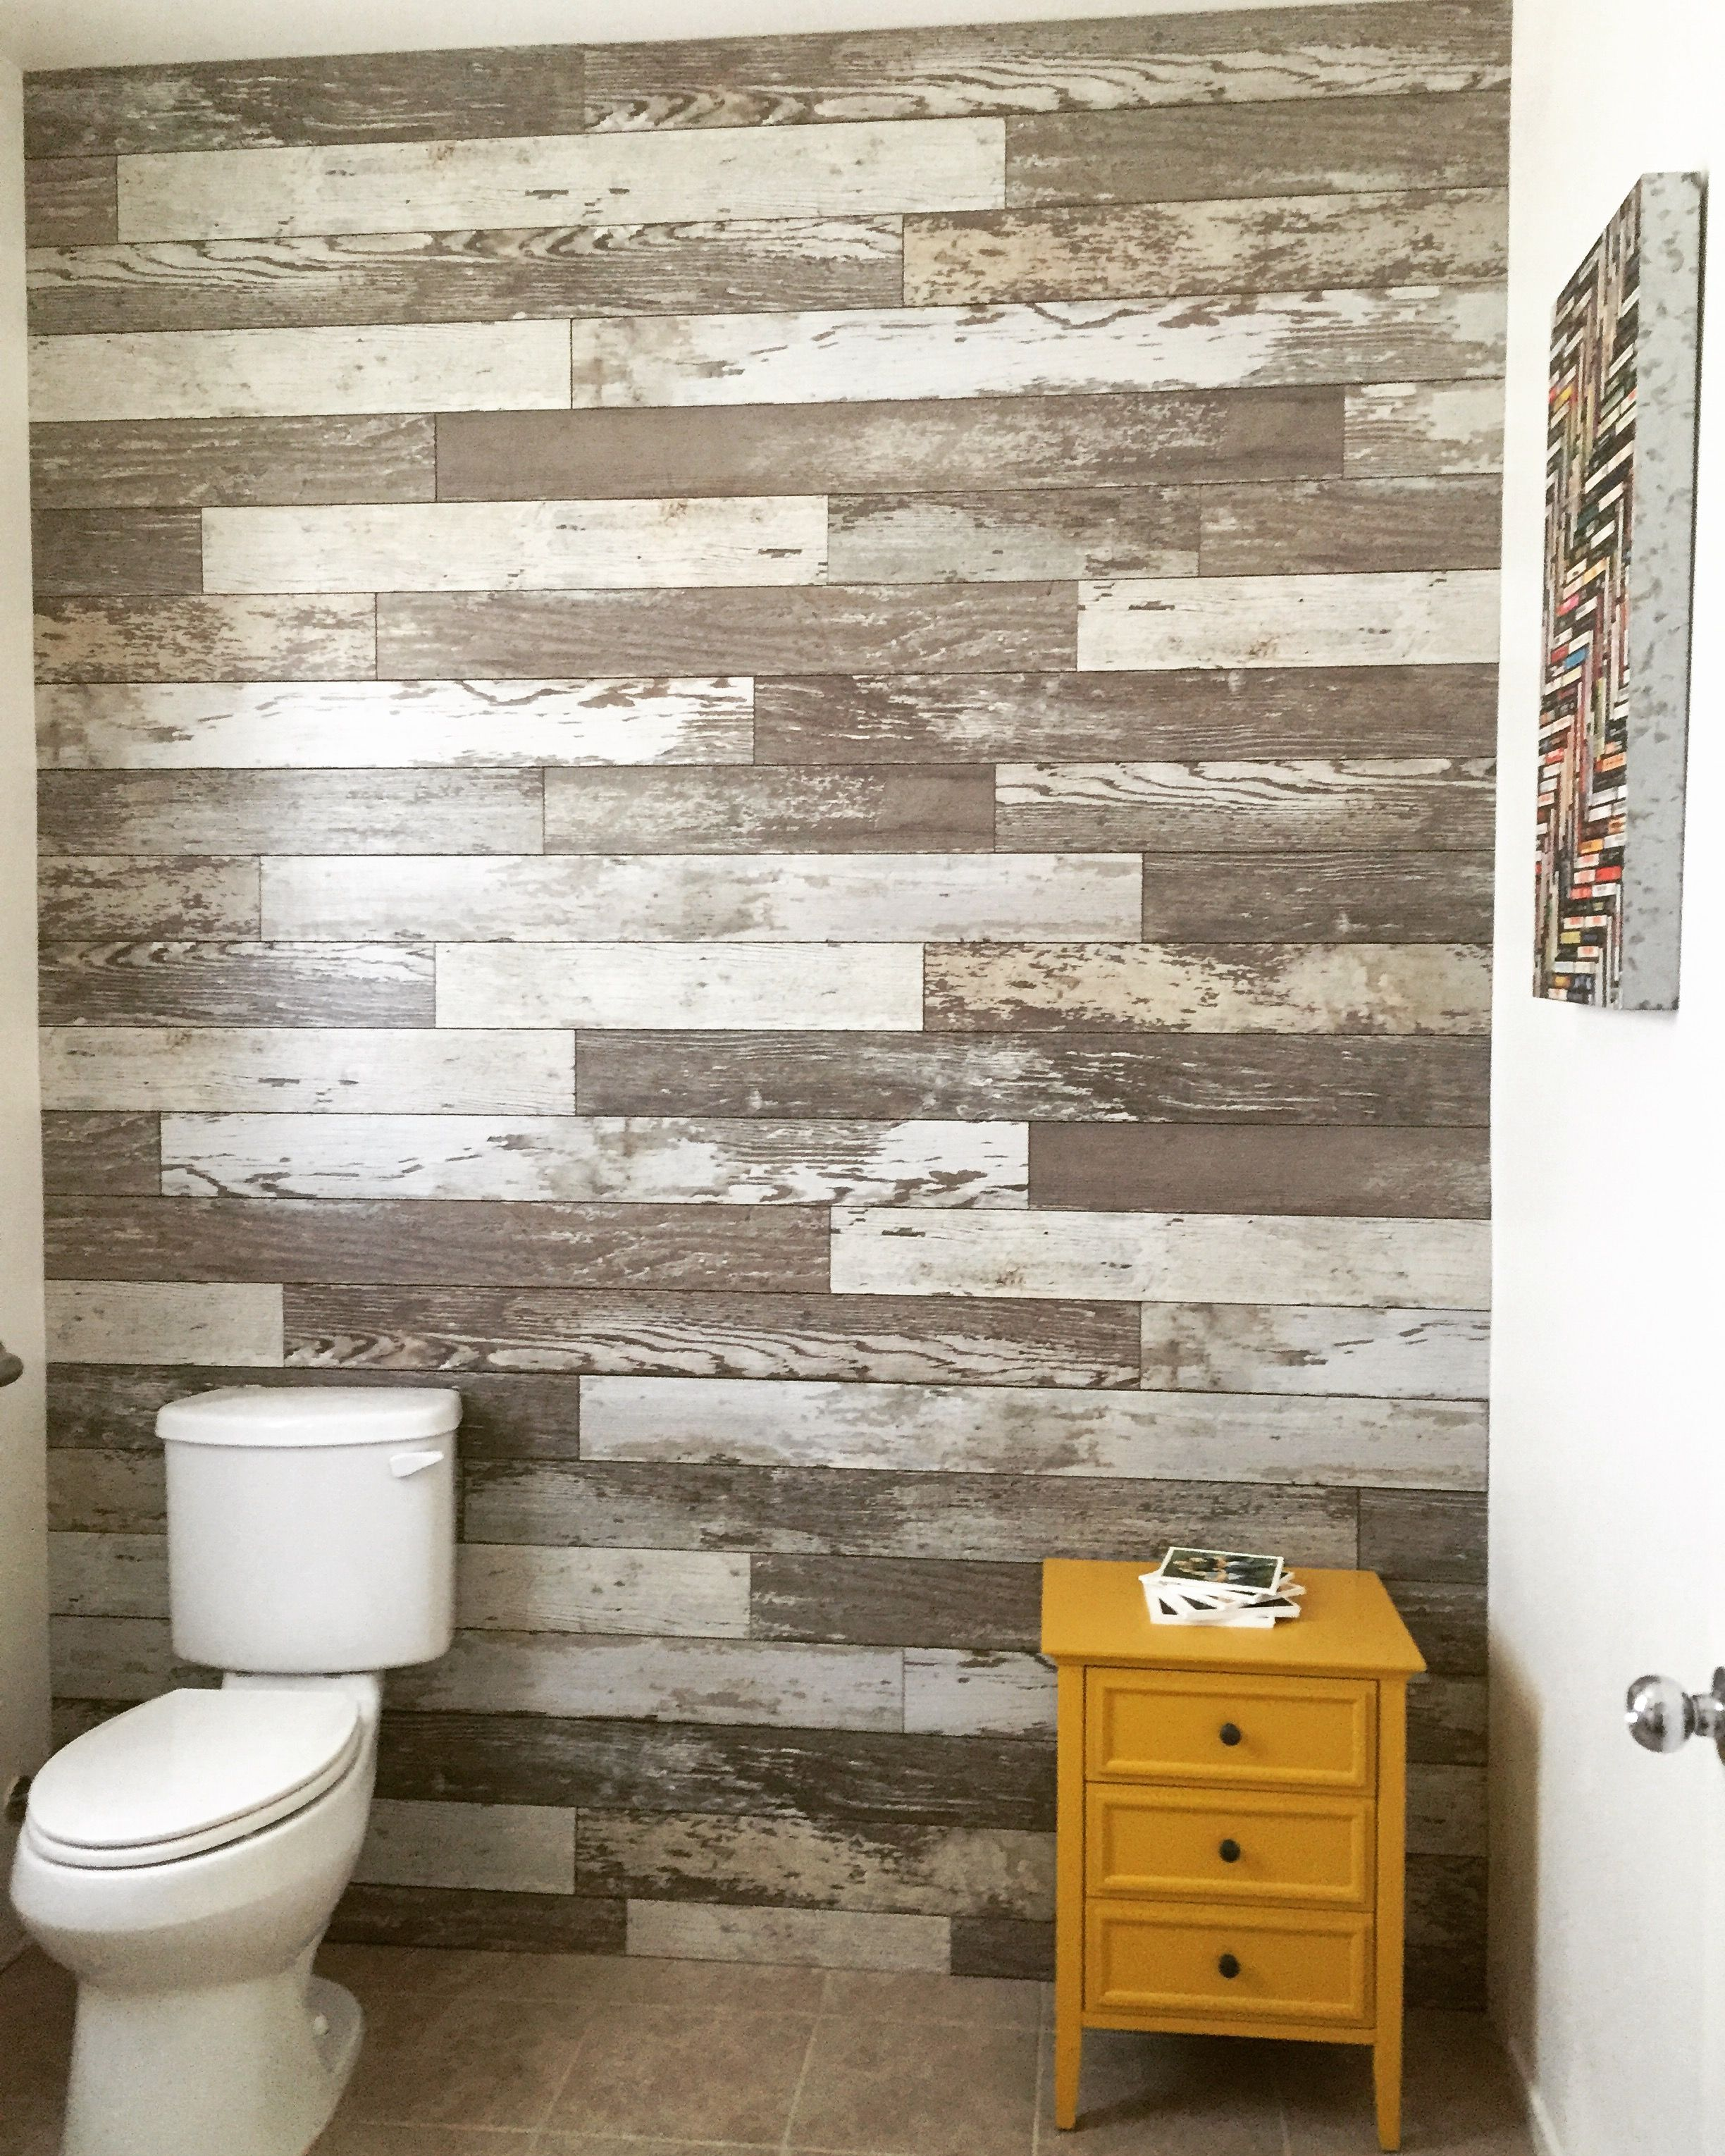 My Husband Created A Laminate Wall Using Bull Barn Oak It S So Awesome Flooring On Walls Laminate Flooring On Walls Laminate Flooring Diy